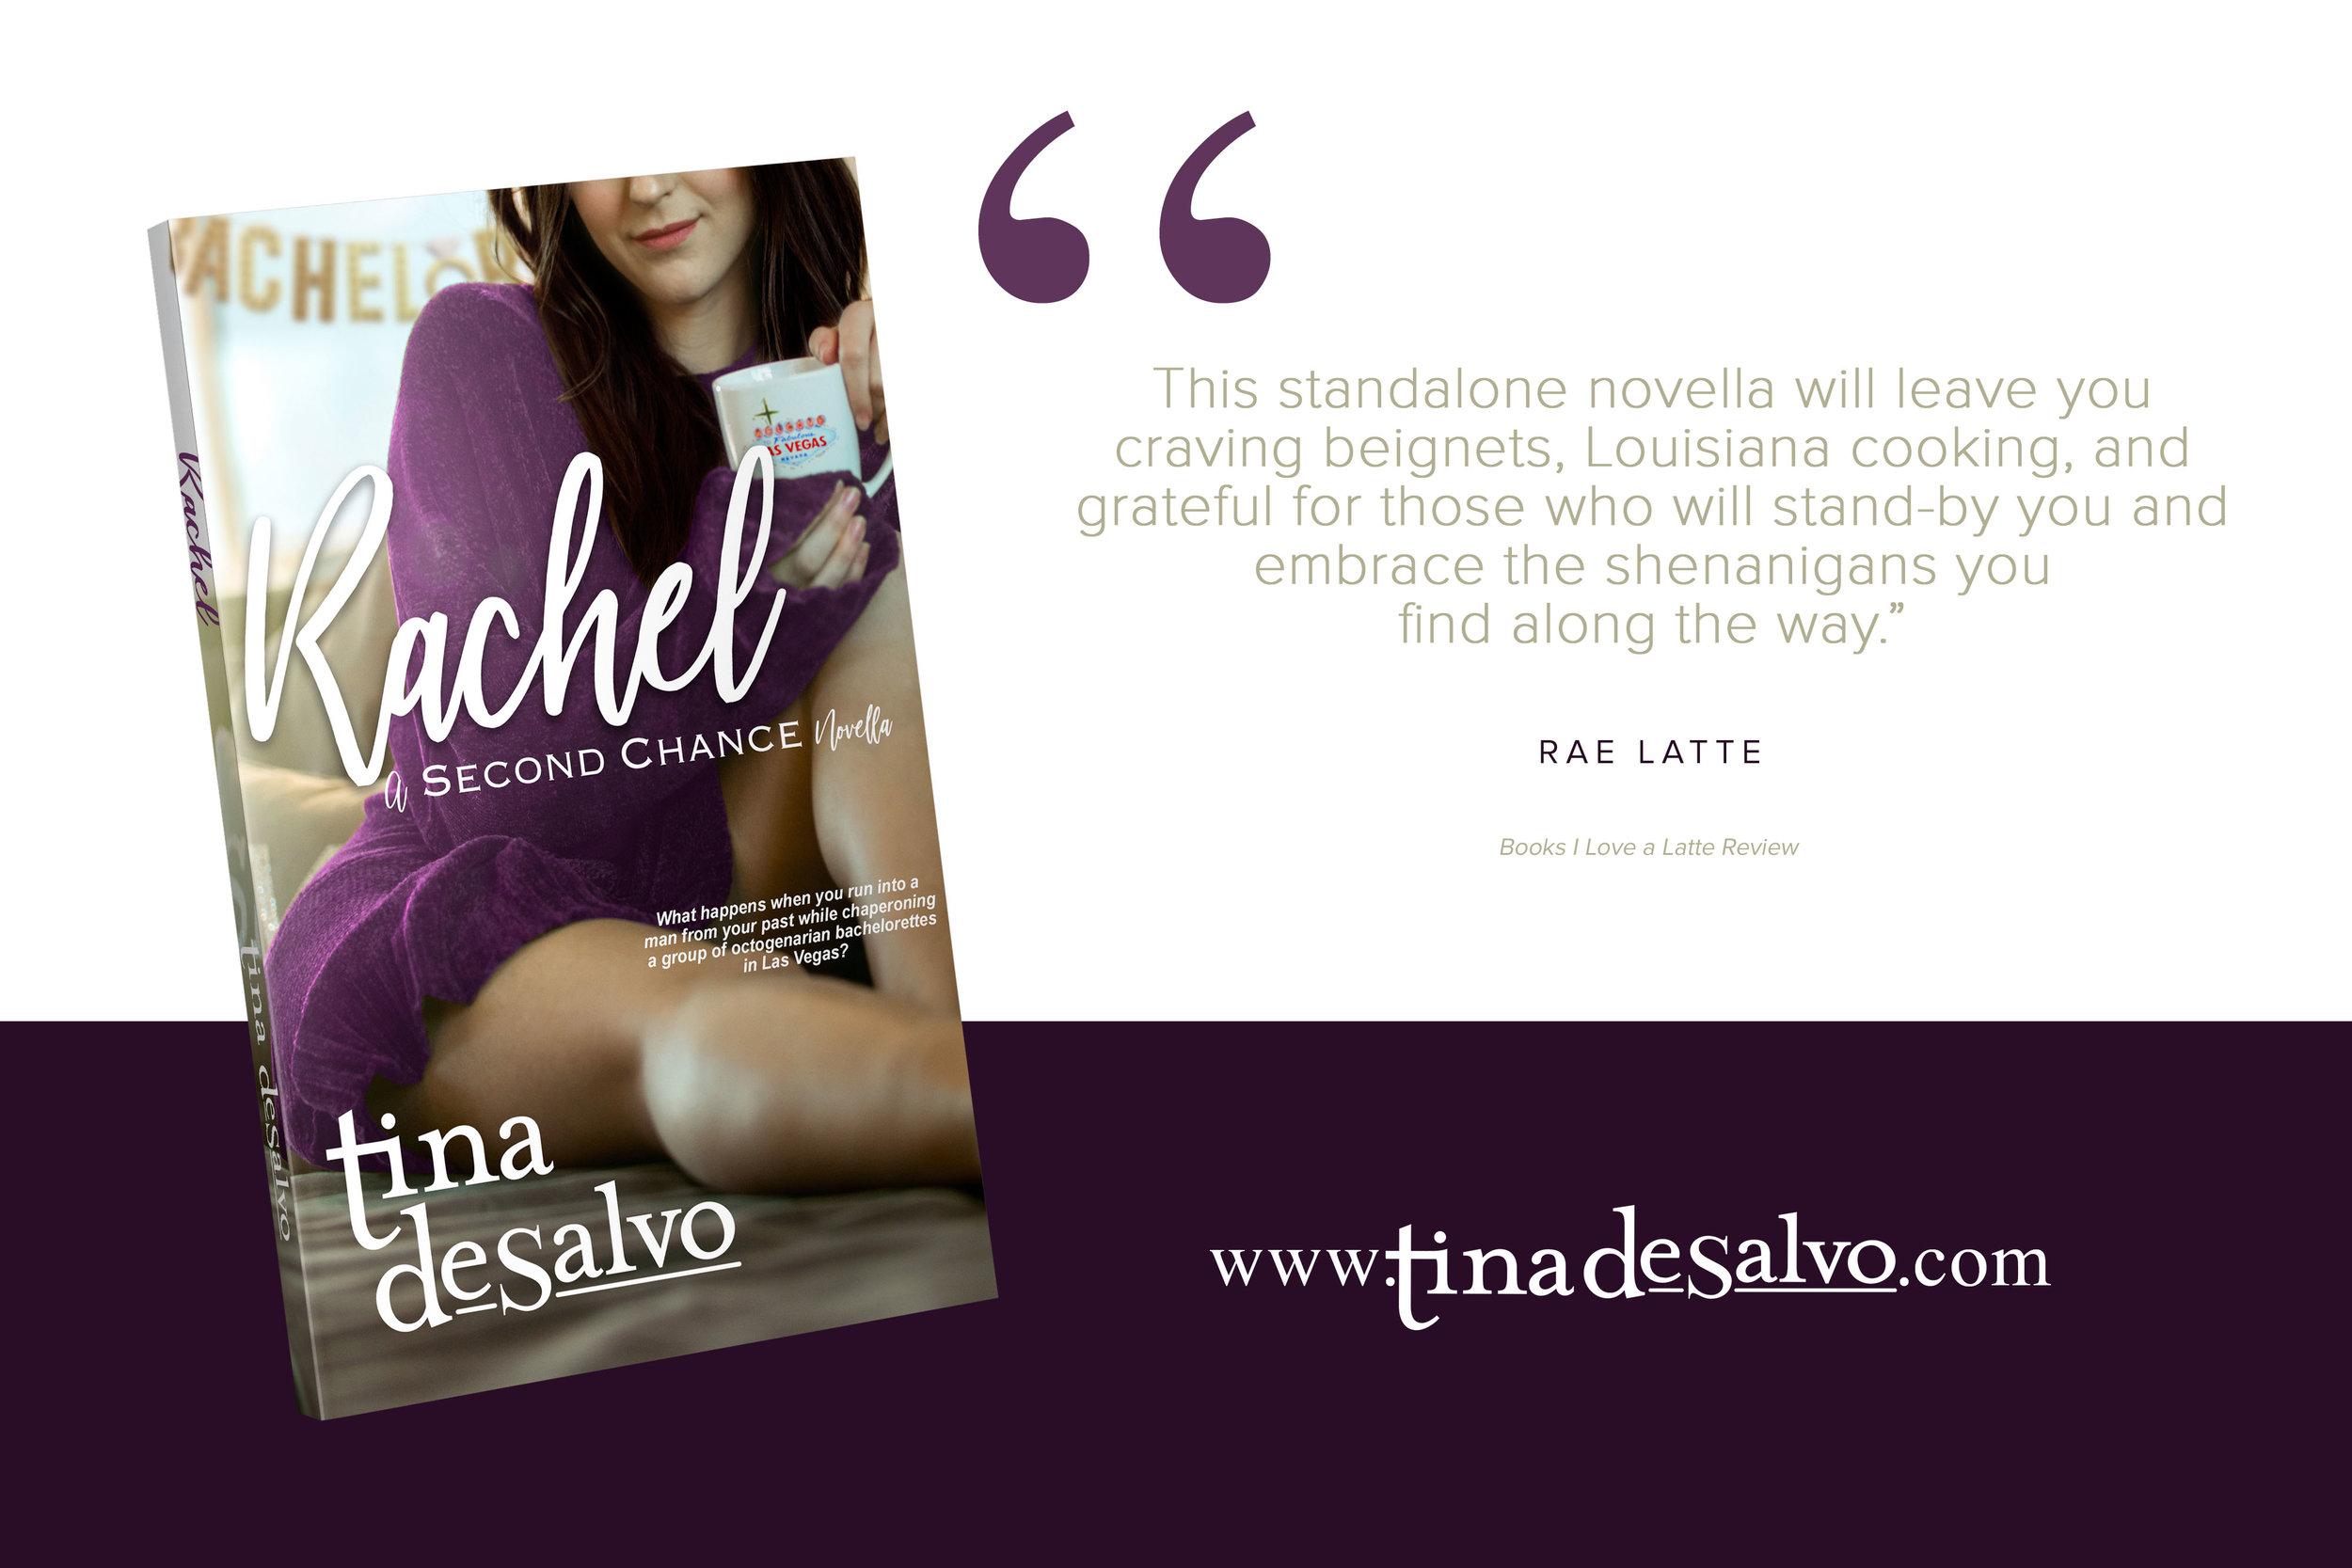 Rachel by Tina DeSalvo